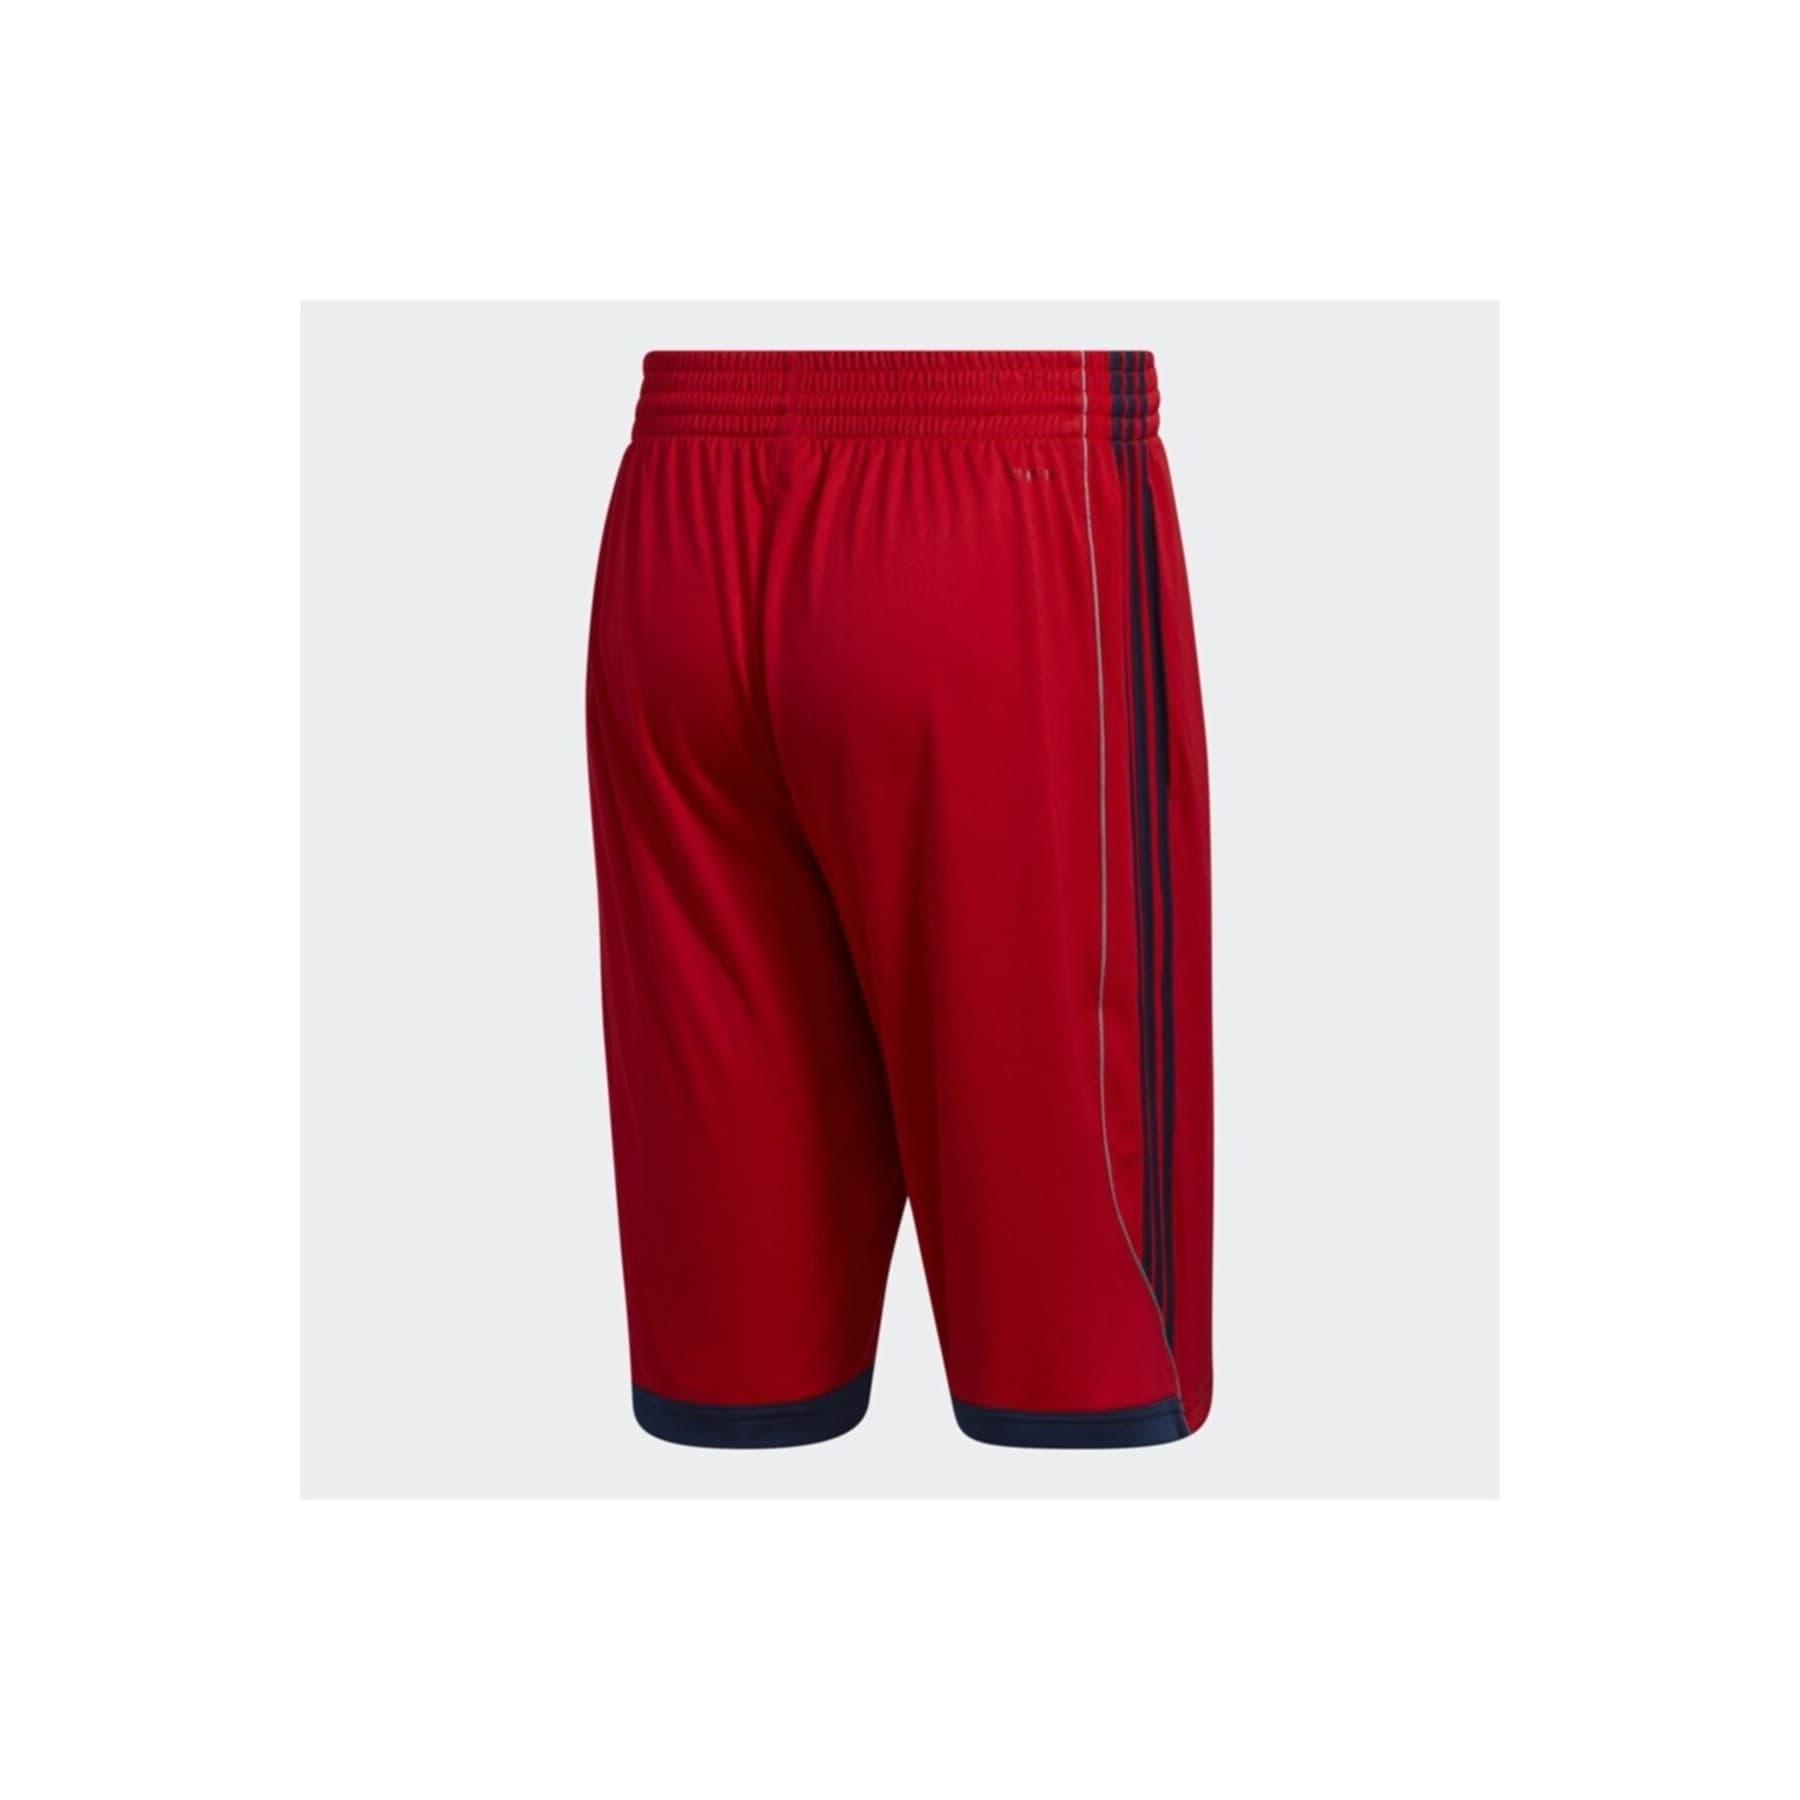 3G Speed Erkek Kırmızı Spor Şort (BQ9874)